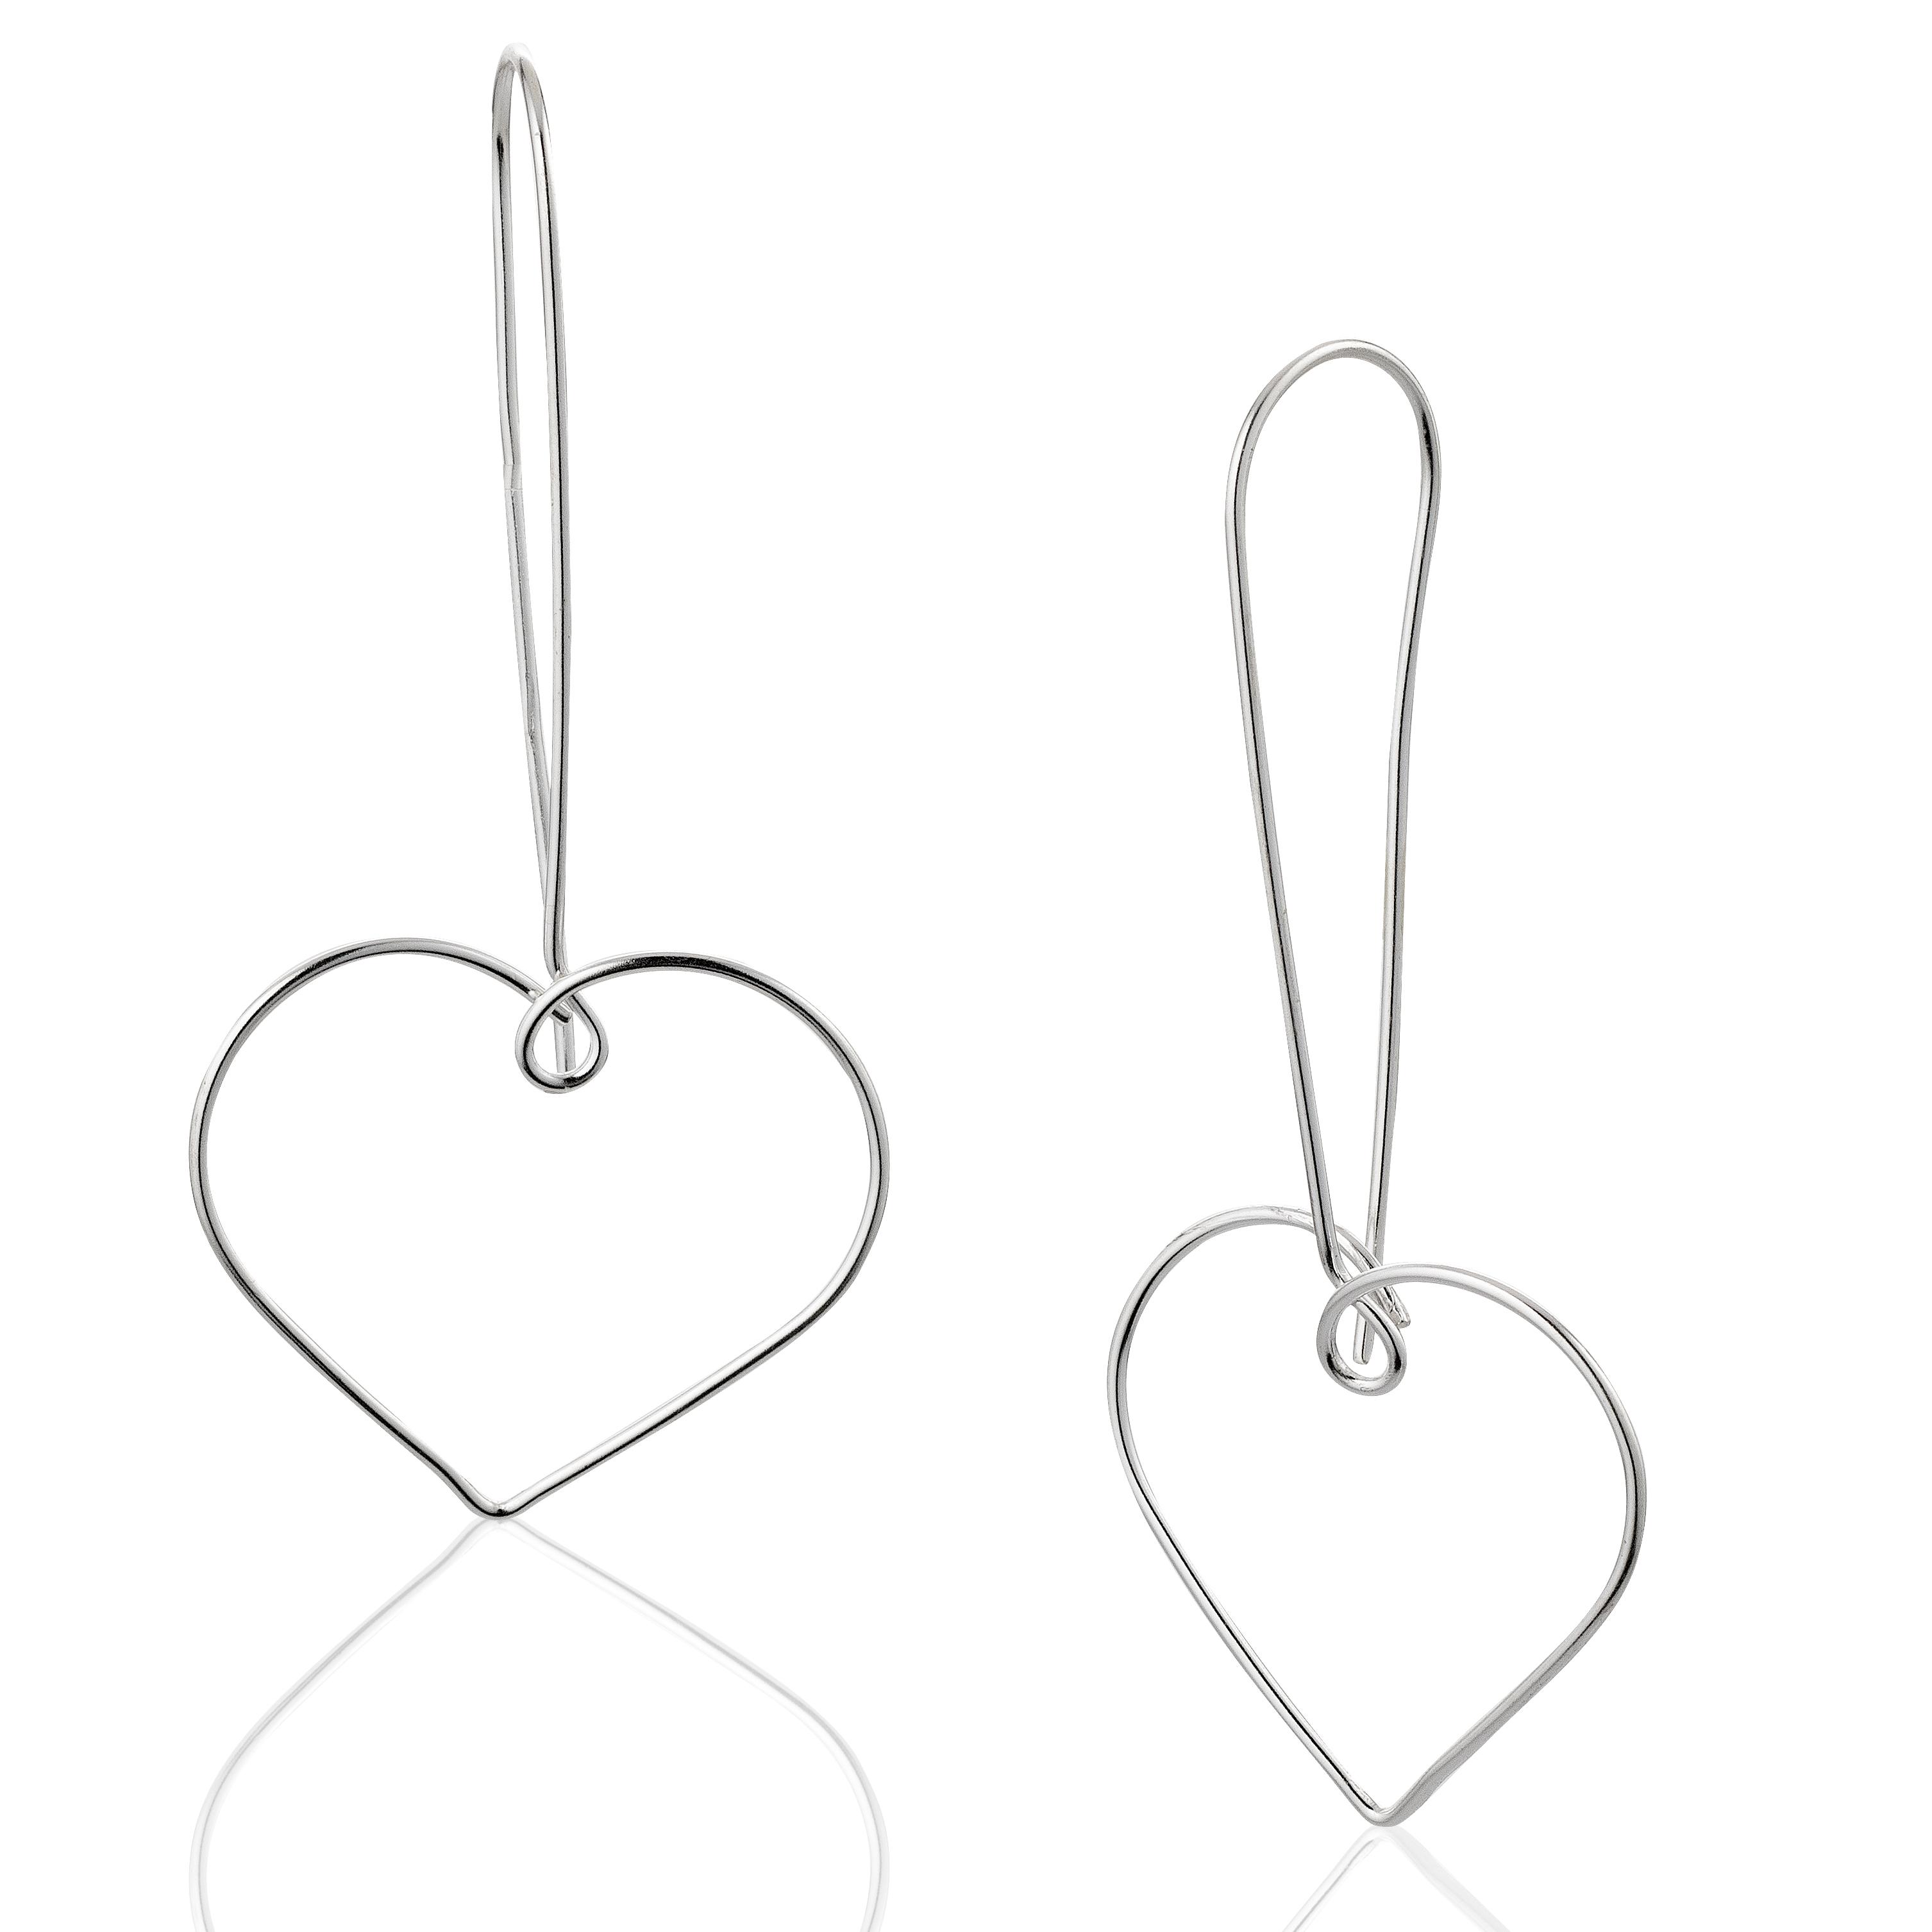 Pure Silver, Anti-Tarnish Thin Line Dangle Heart Earrings, Love Jewelry, Women, Teens, Girls